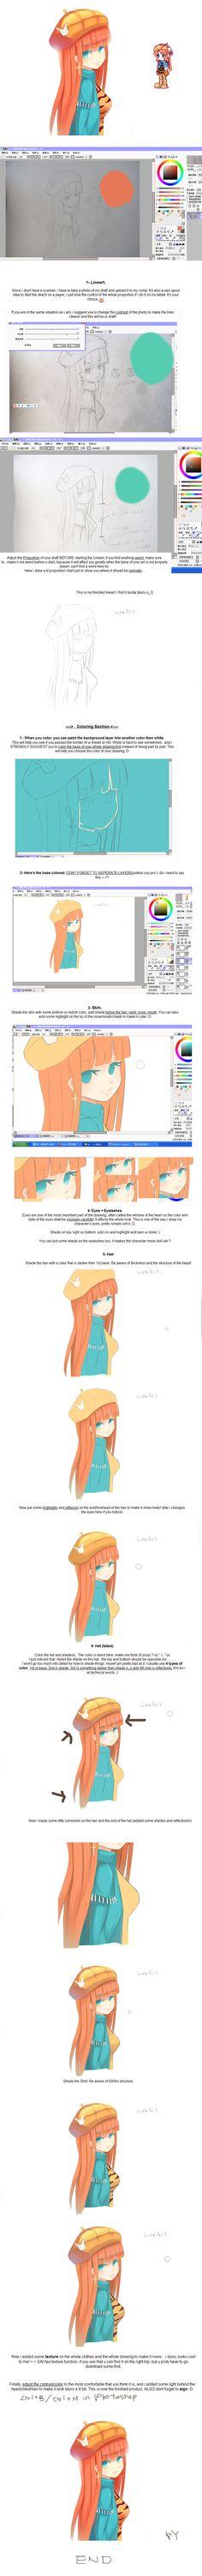 Simple Anime Girl Tutorial by PolkaDotedFlower.deviantart.com on @deviantART